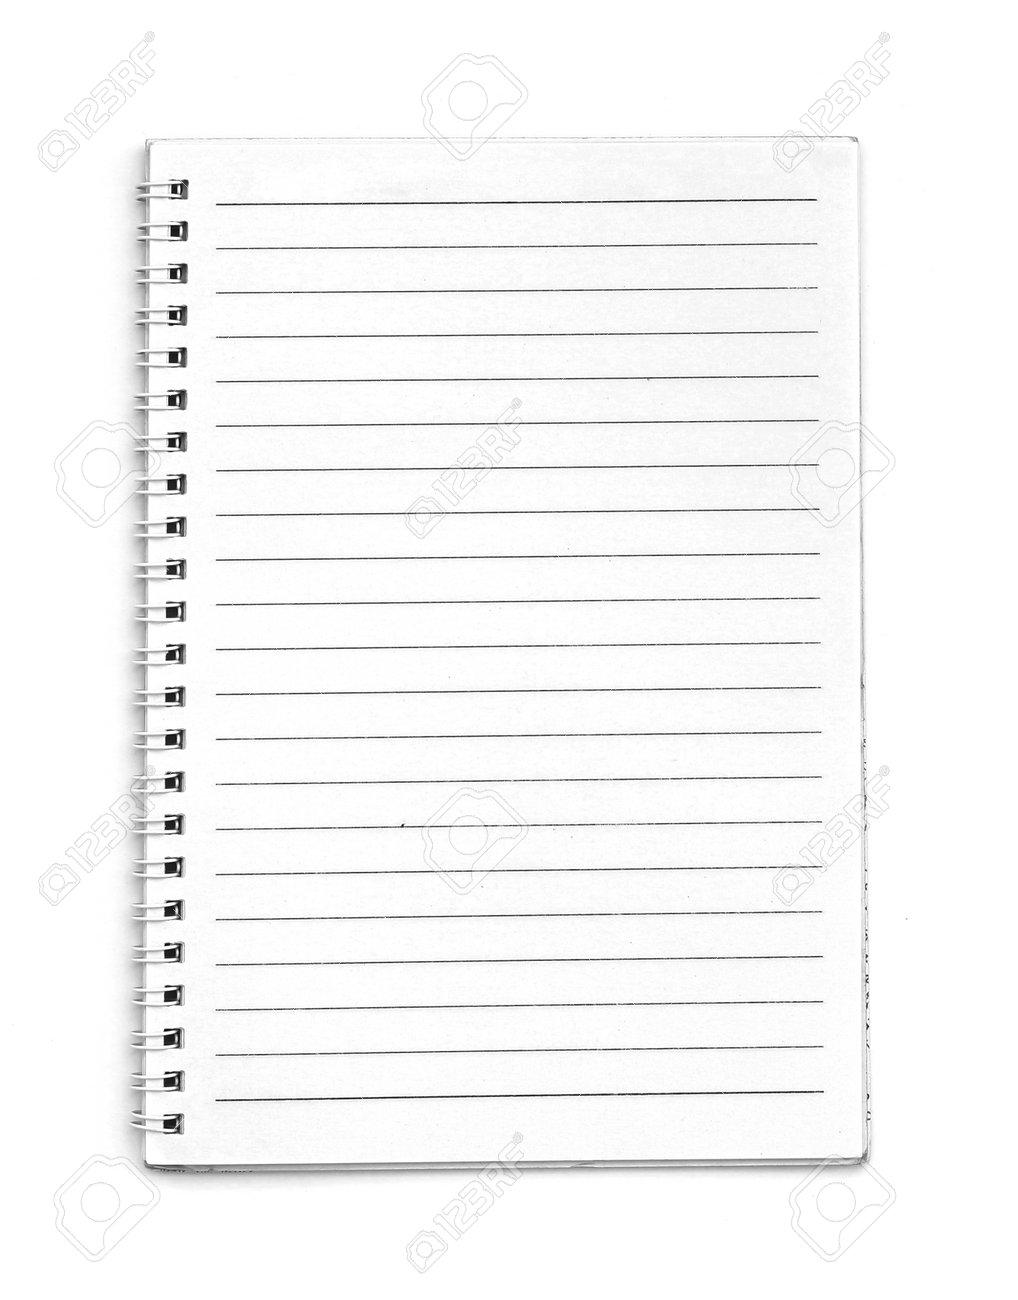 Blank line notebook - 166486159